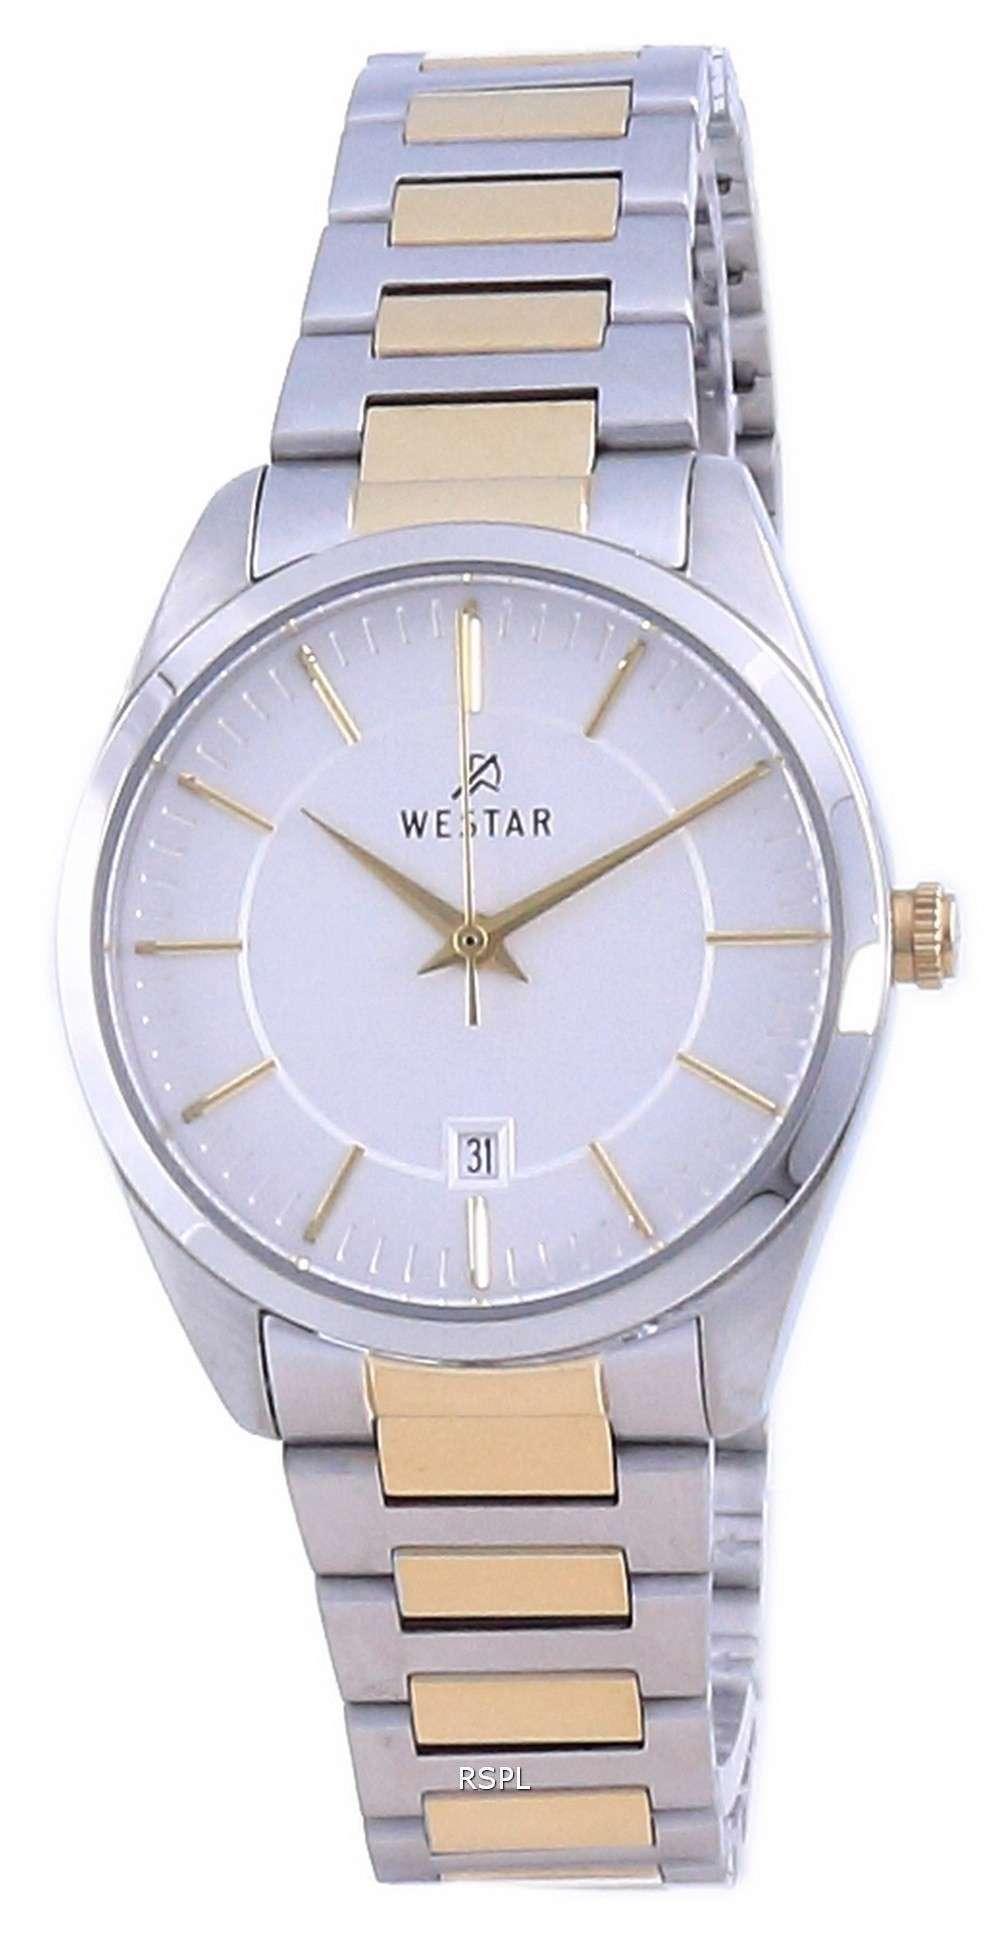 Westar Silver Dial Two Tone Stainless Steel Quartz 40213 CBN 107 Reloj para mujer